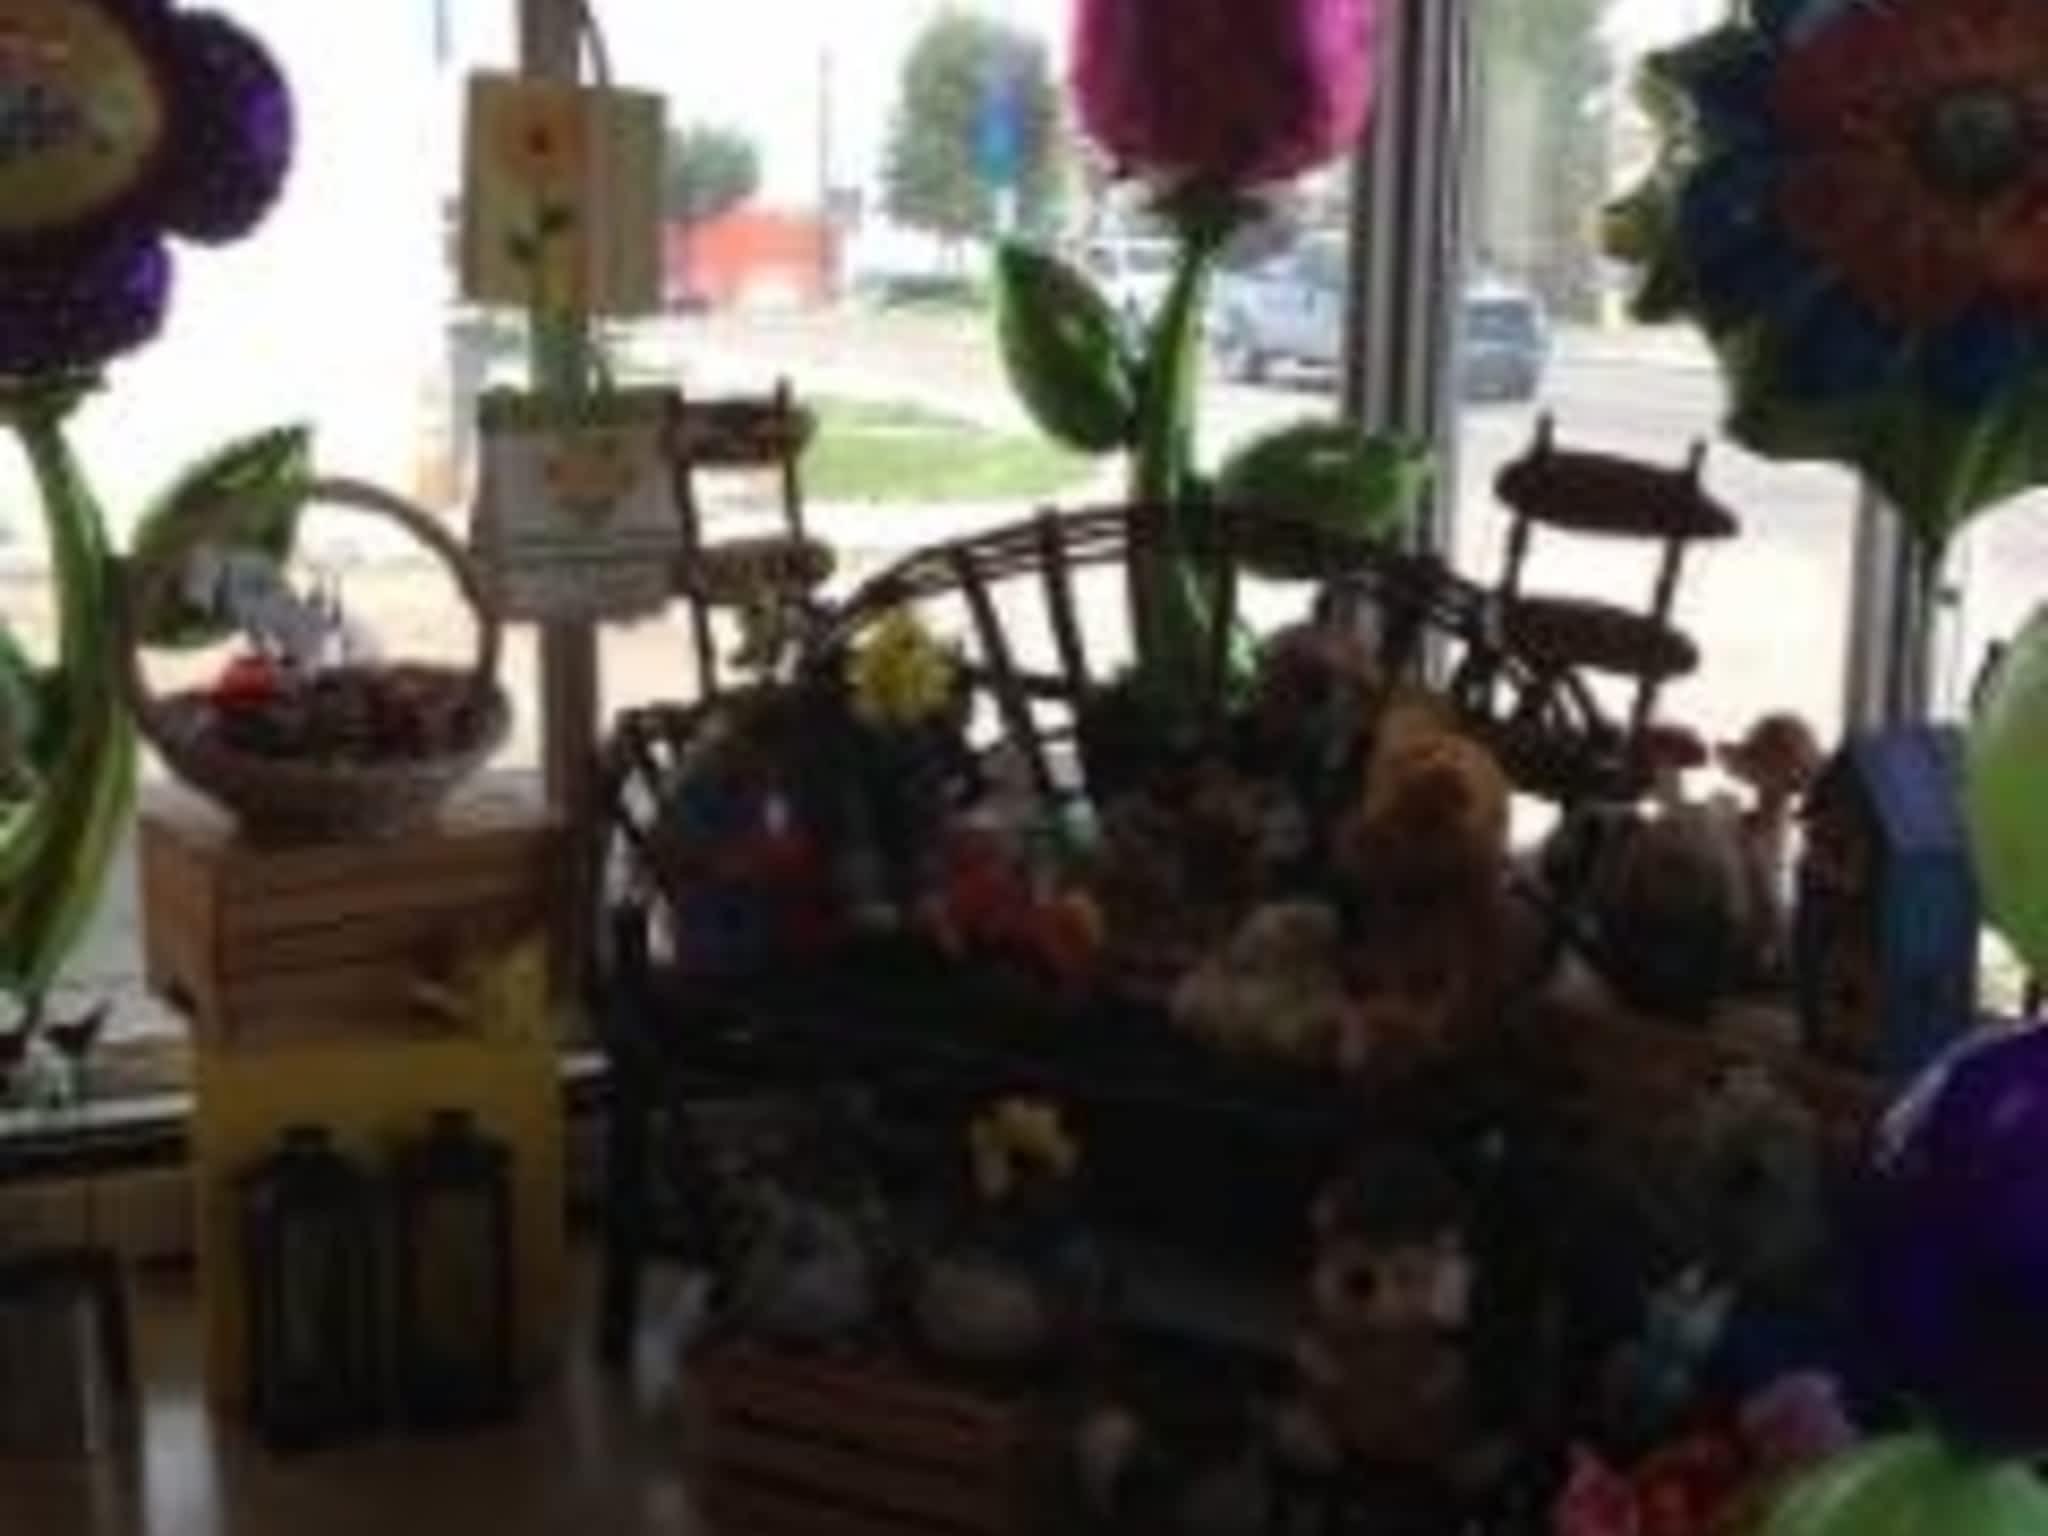 photo The Balloon Store